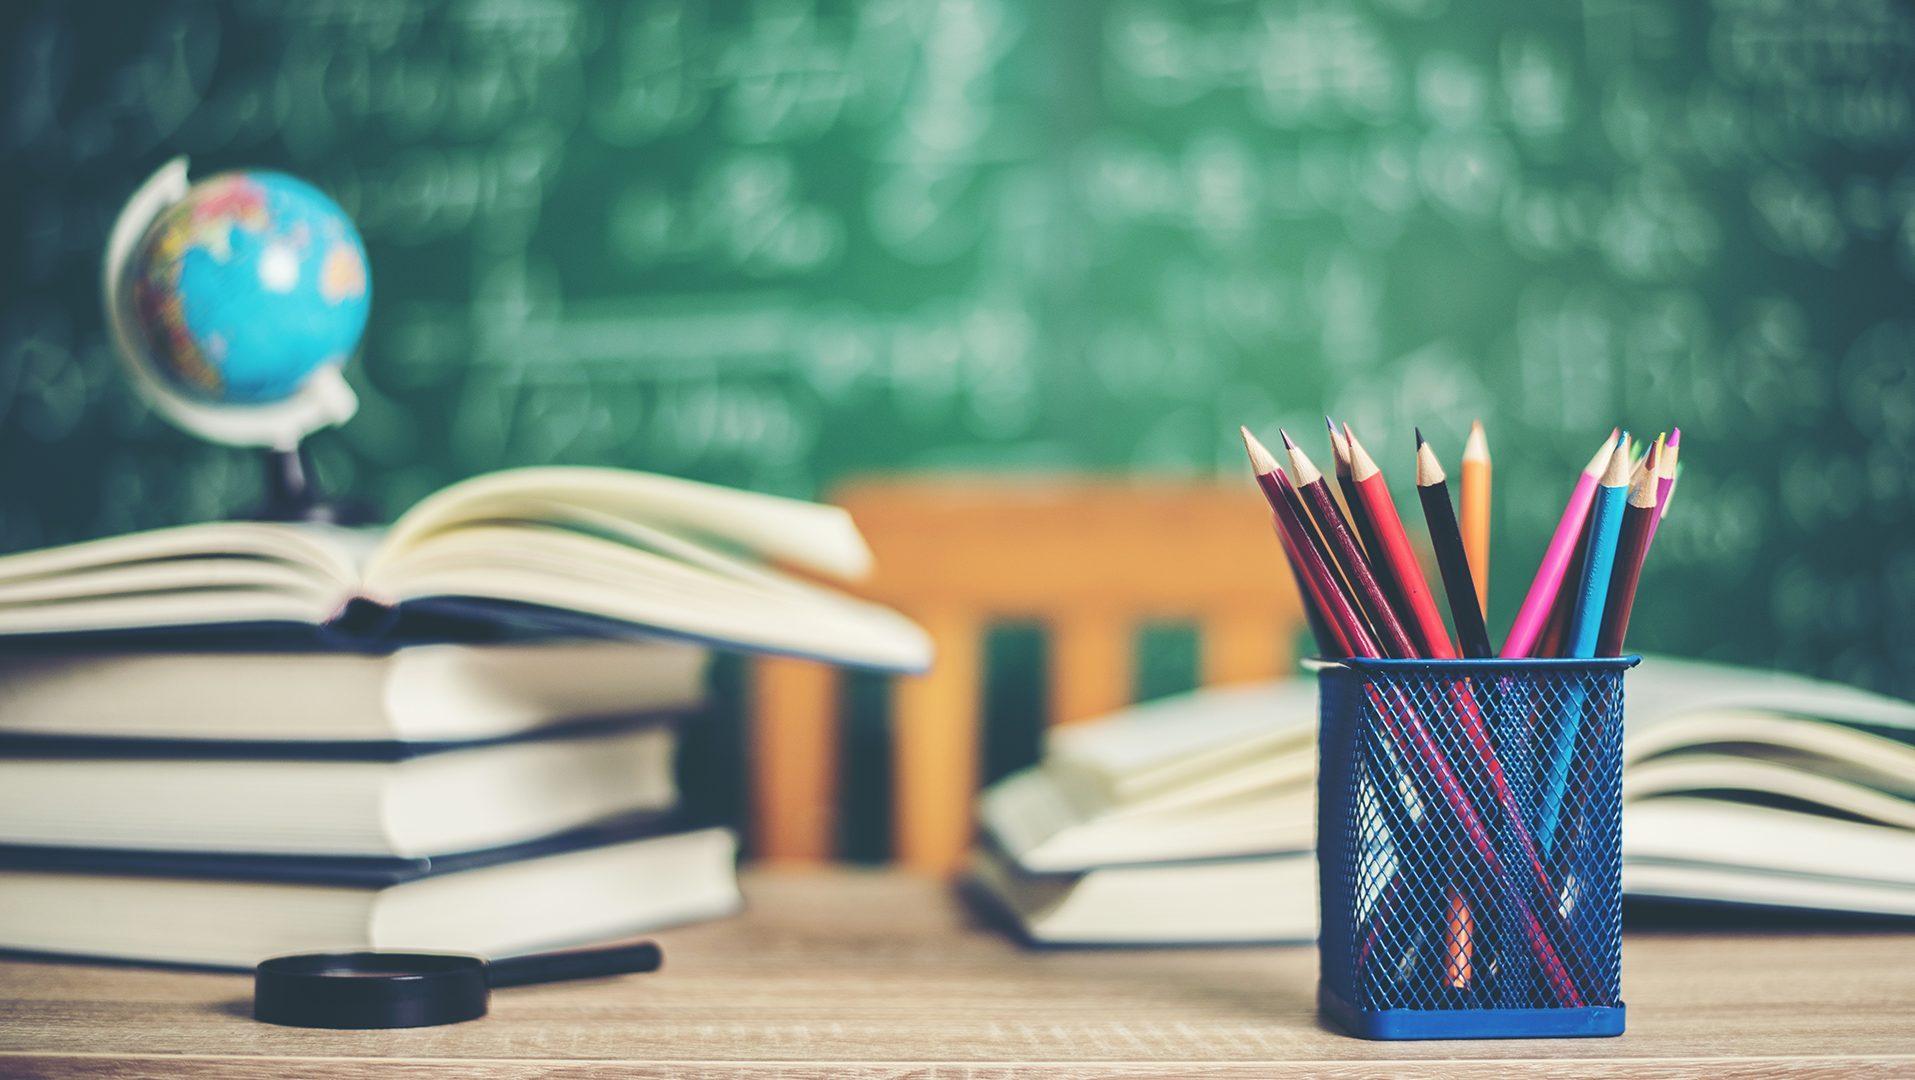 Detalhes - Seguro de Vida Educacional Previsul